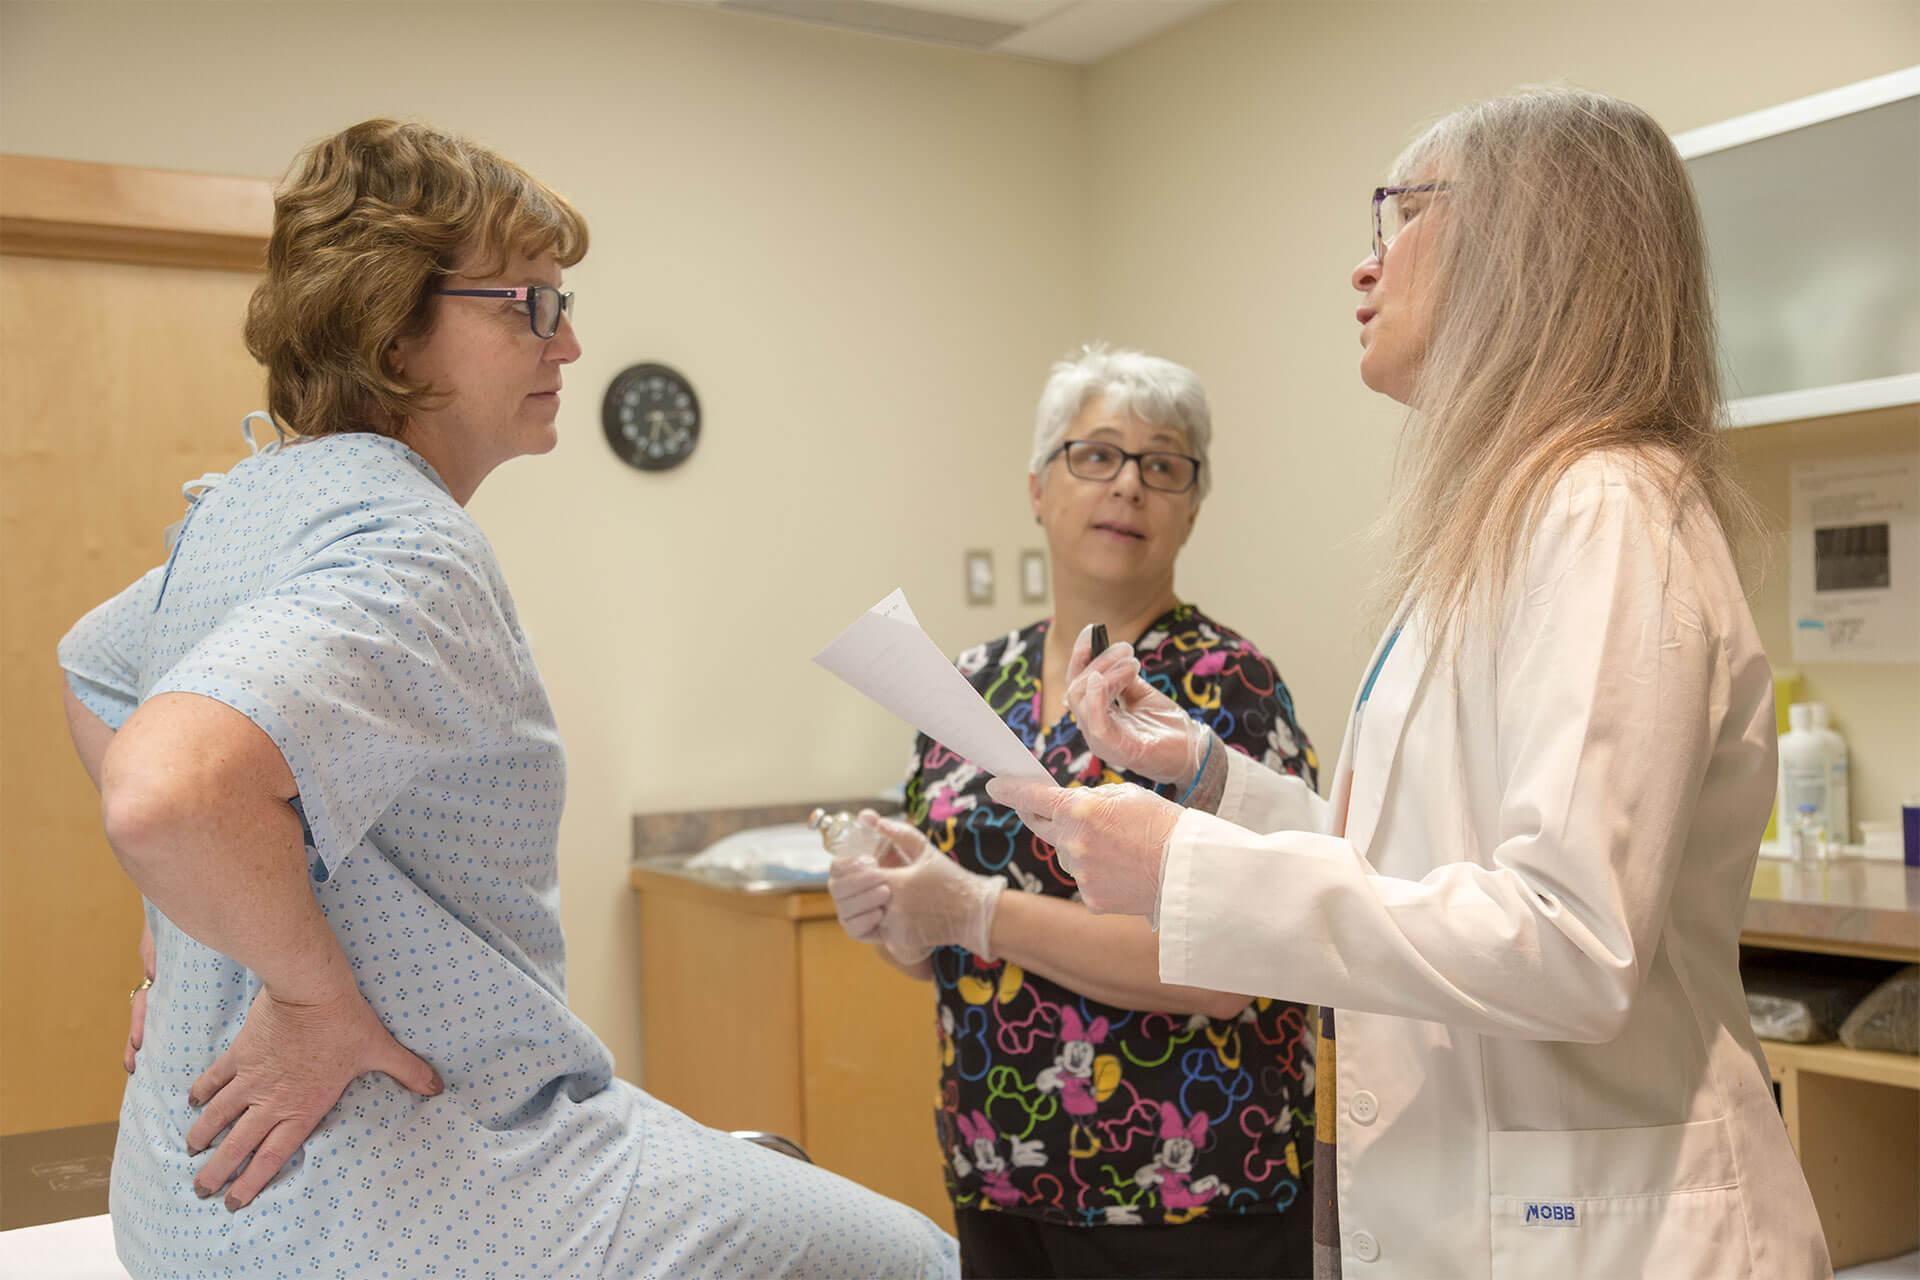 Ultrasound-Guided Biopsy